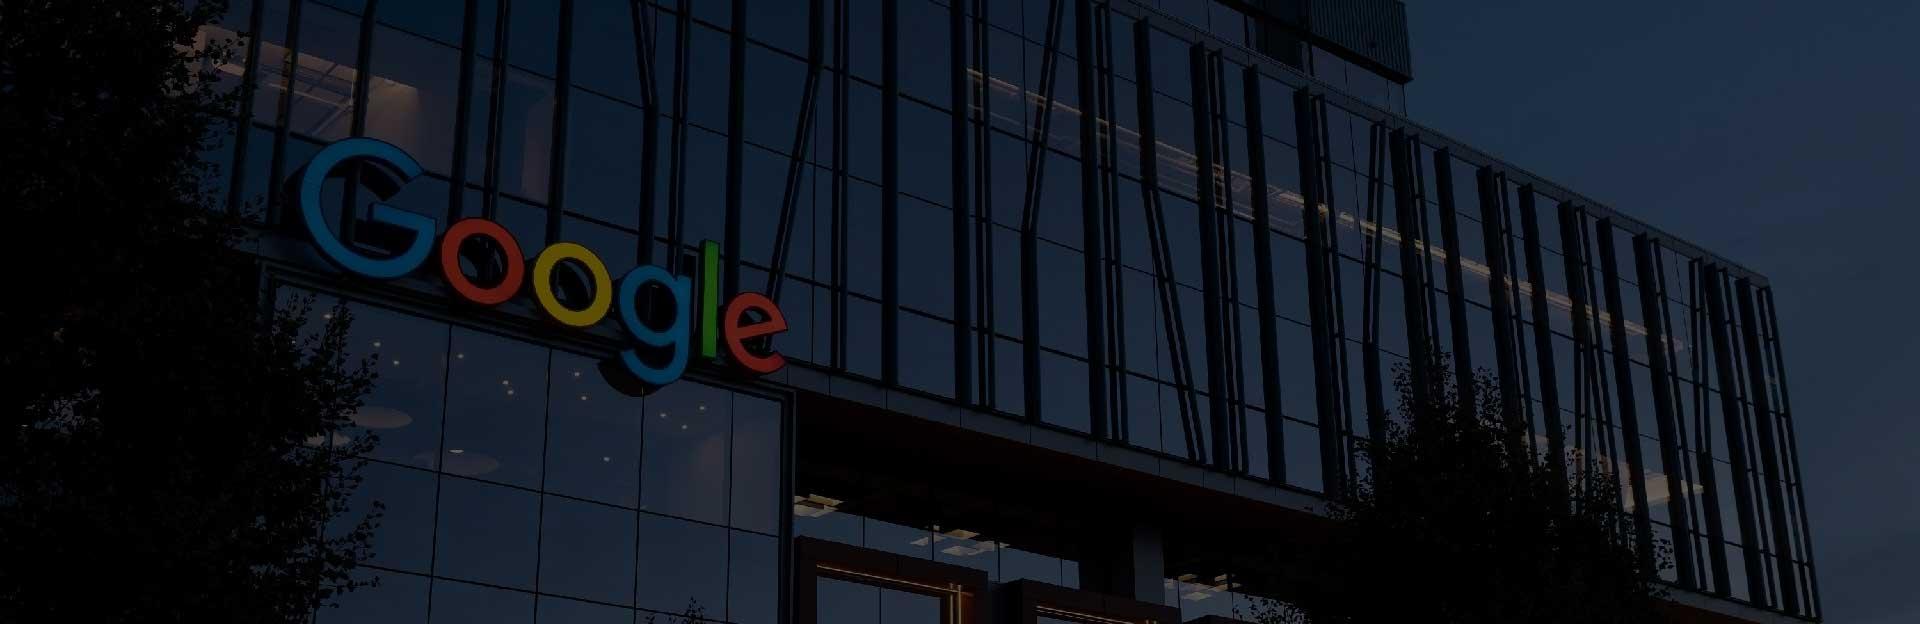 Google Reklamı